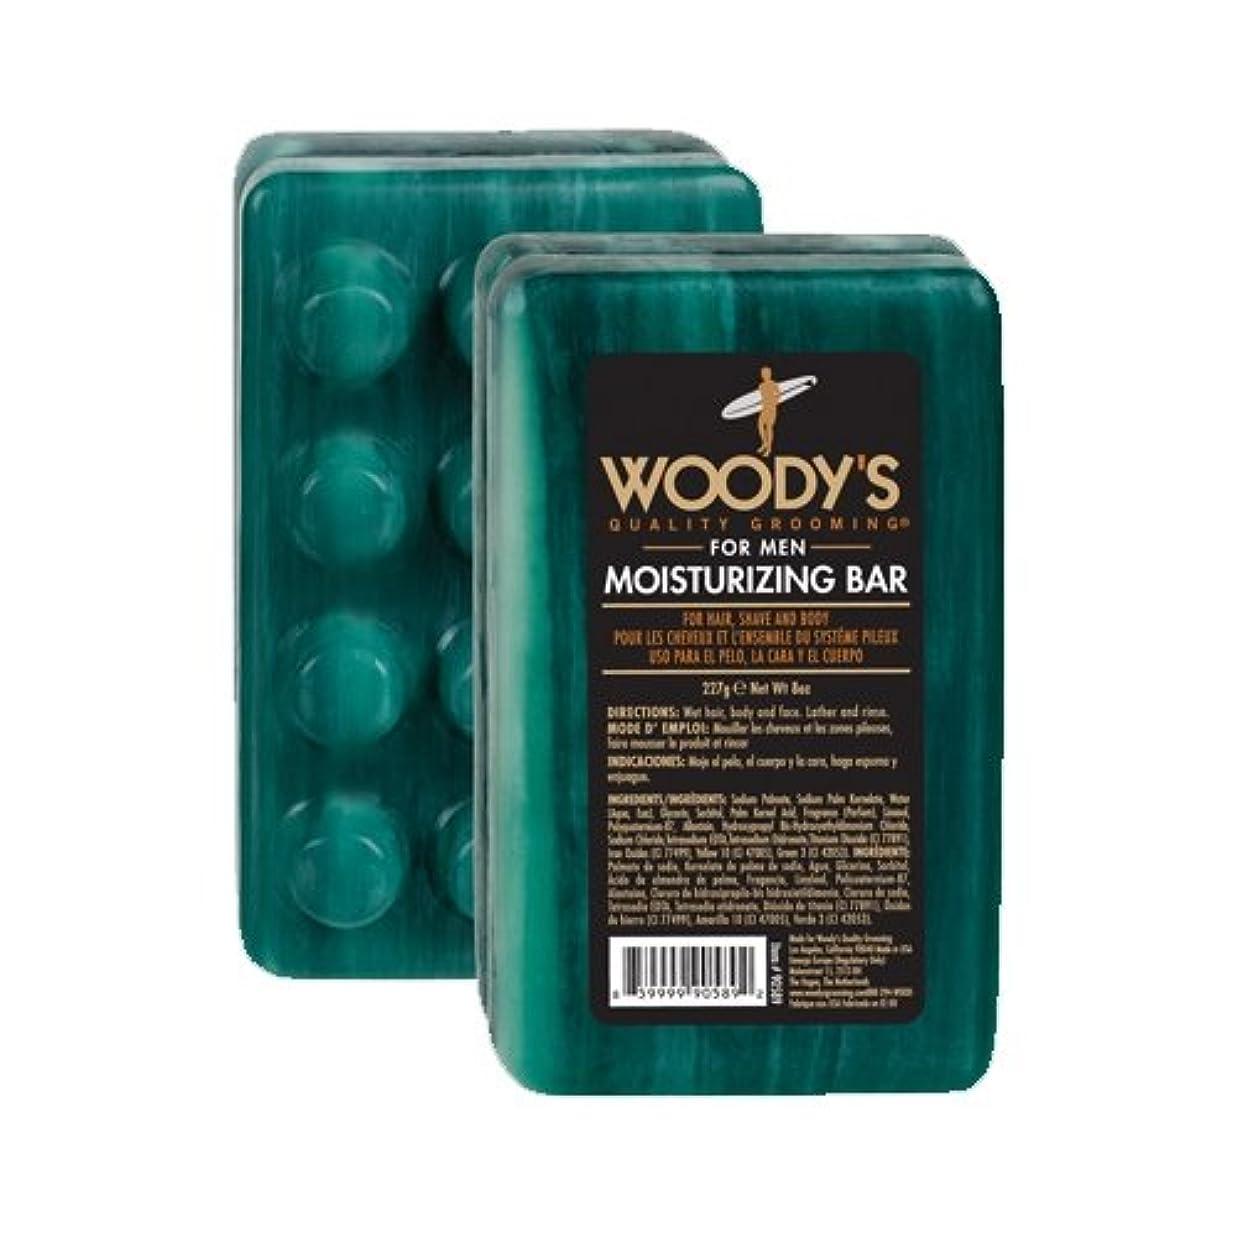 合唱団後世湿原Woody's Moisturizing Bar 8oz